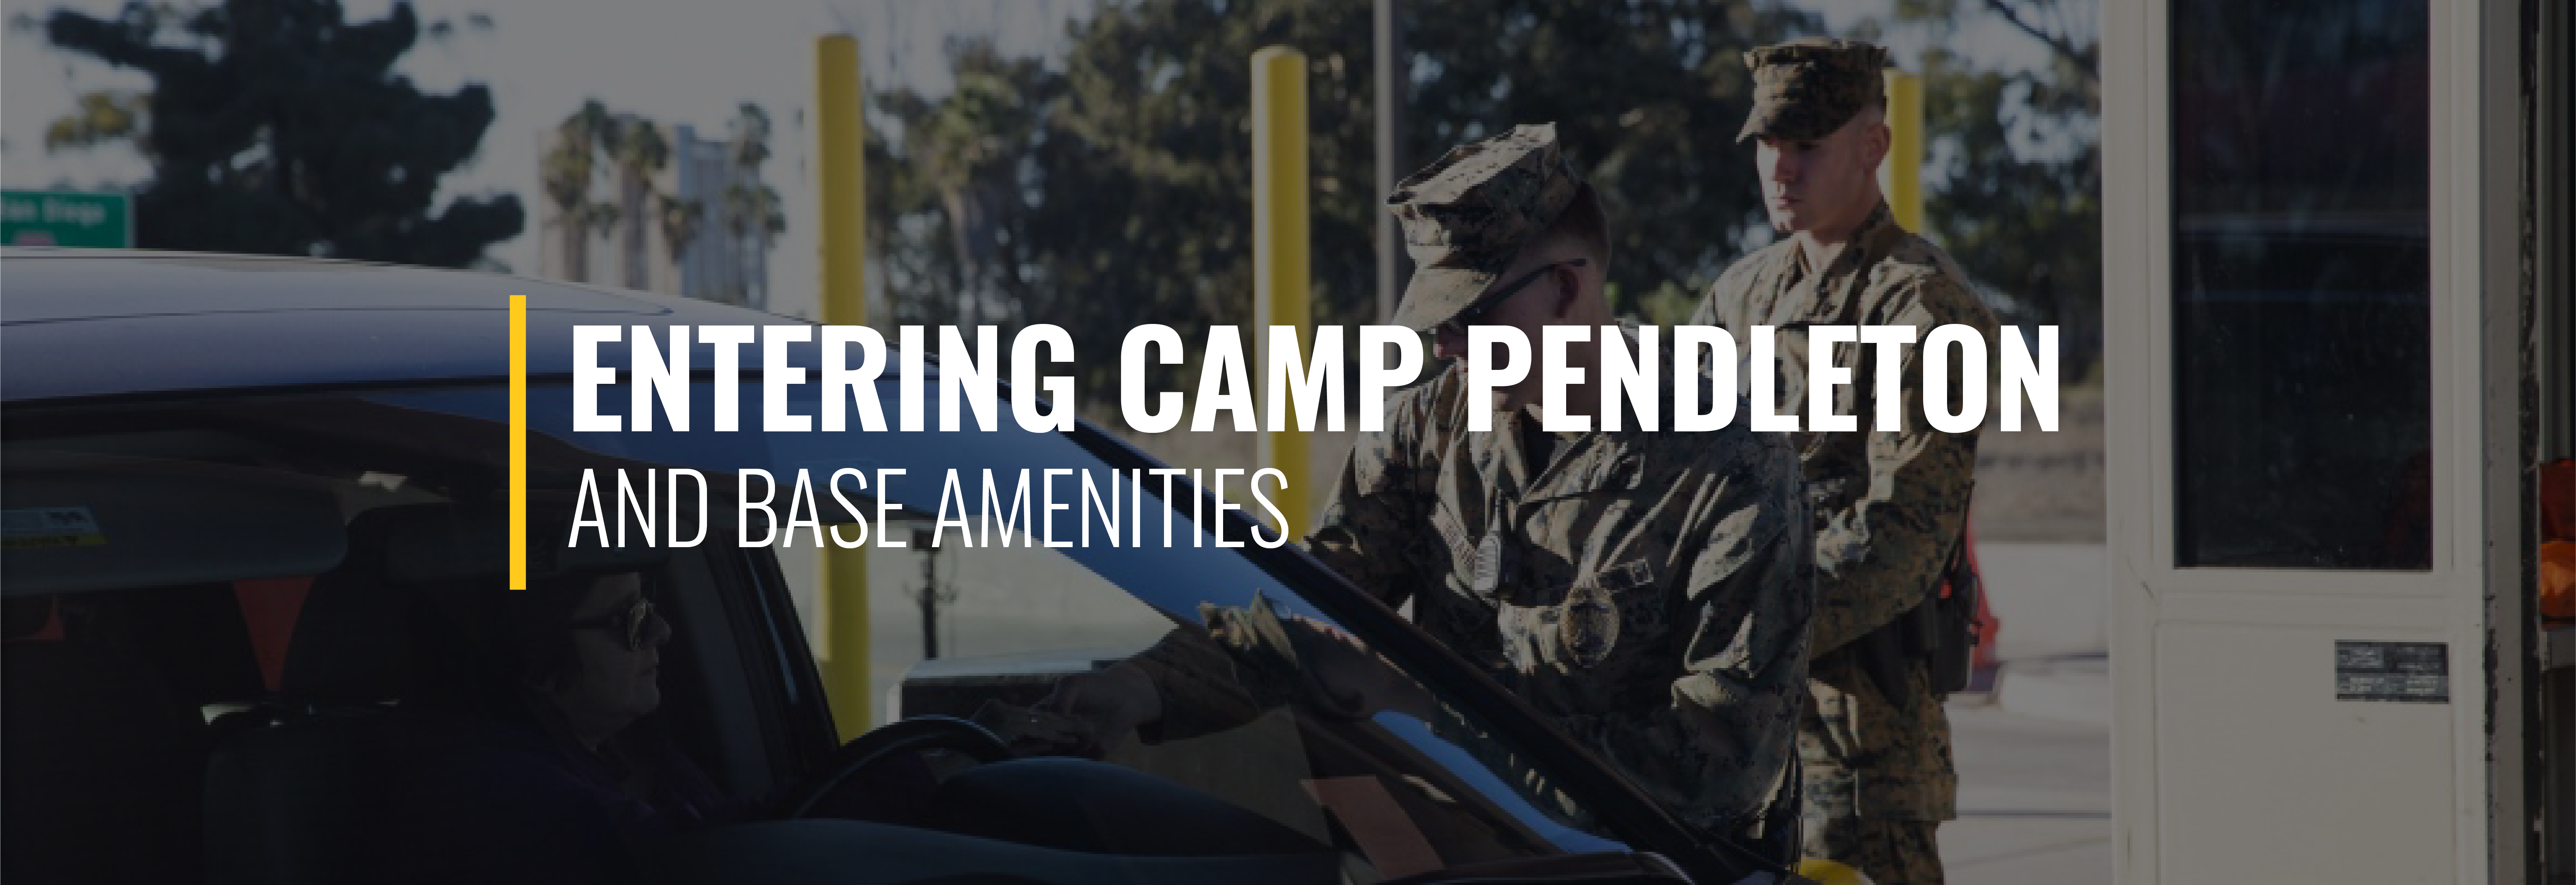 Entering Camp Pendleton and Base Amenities